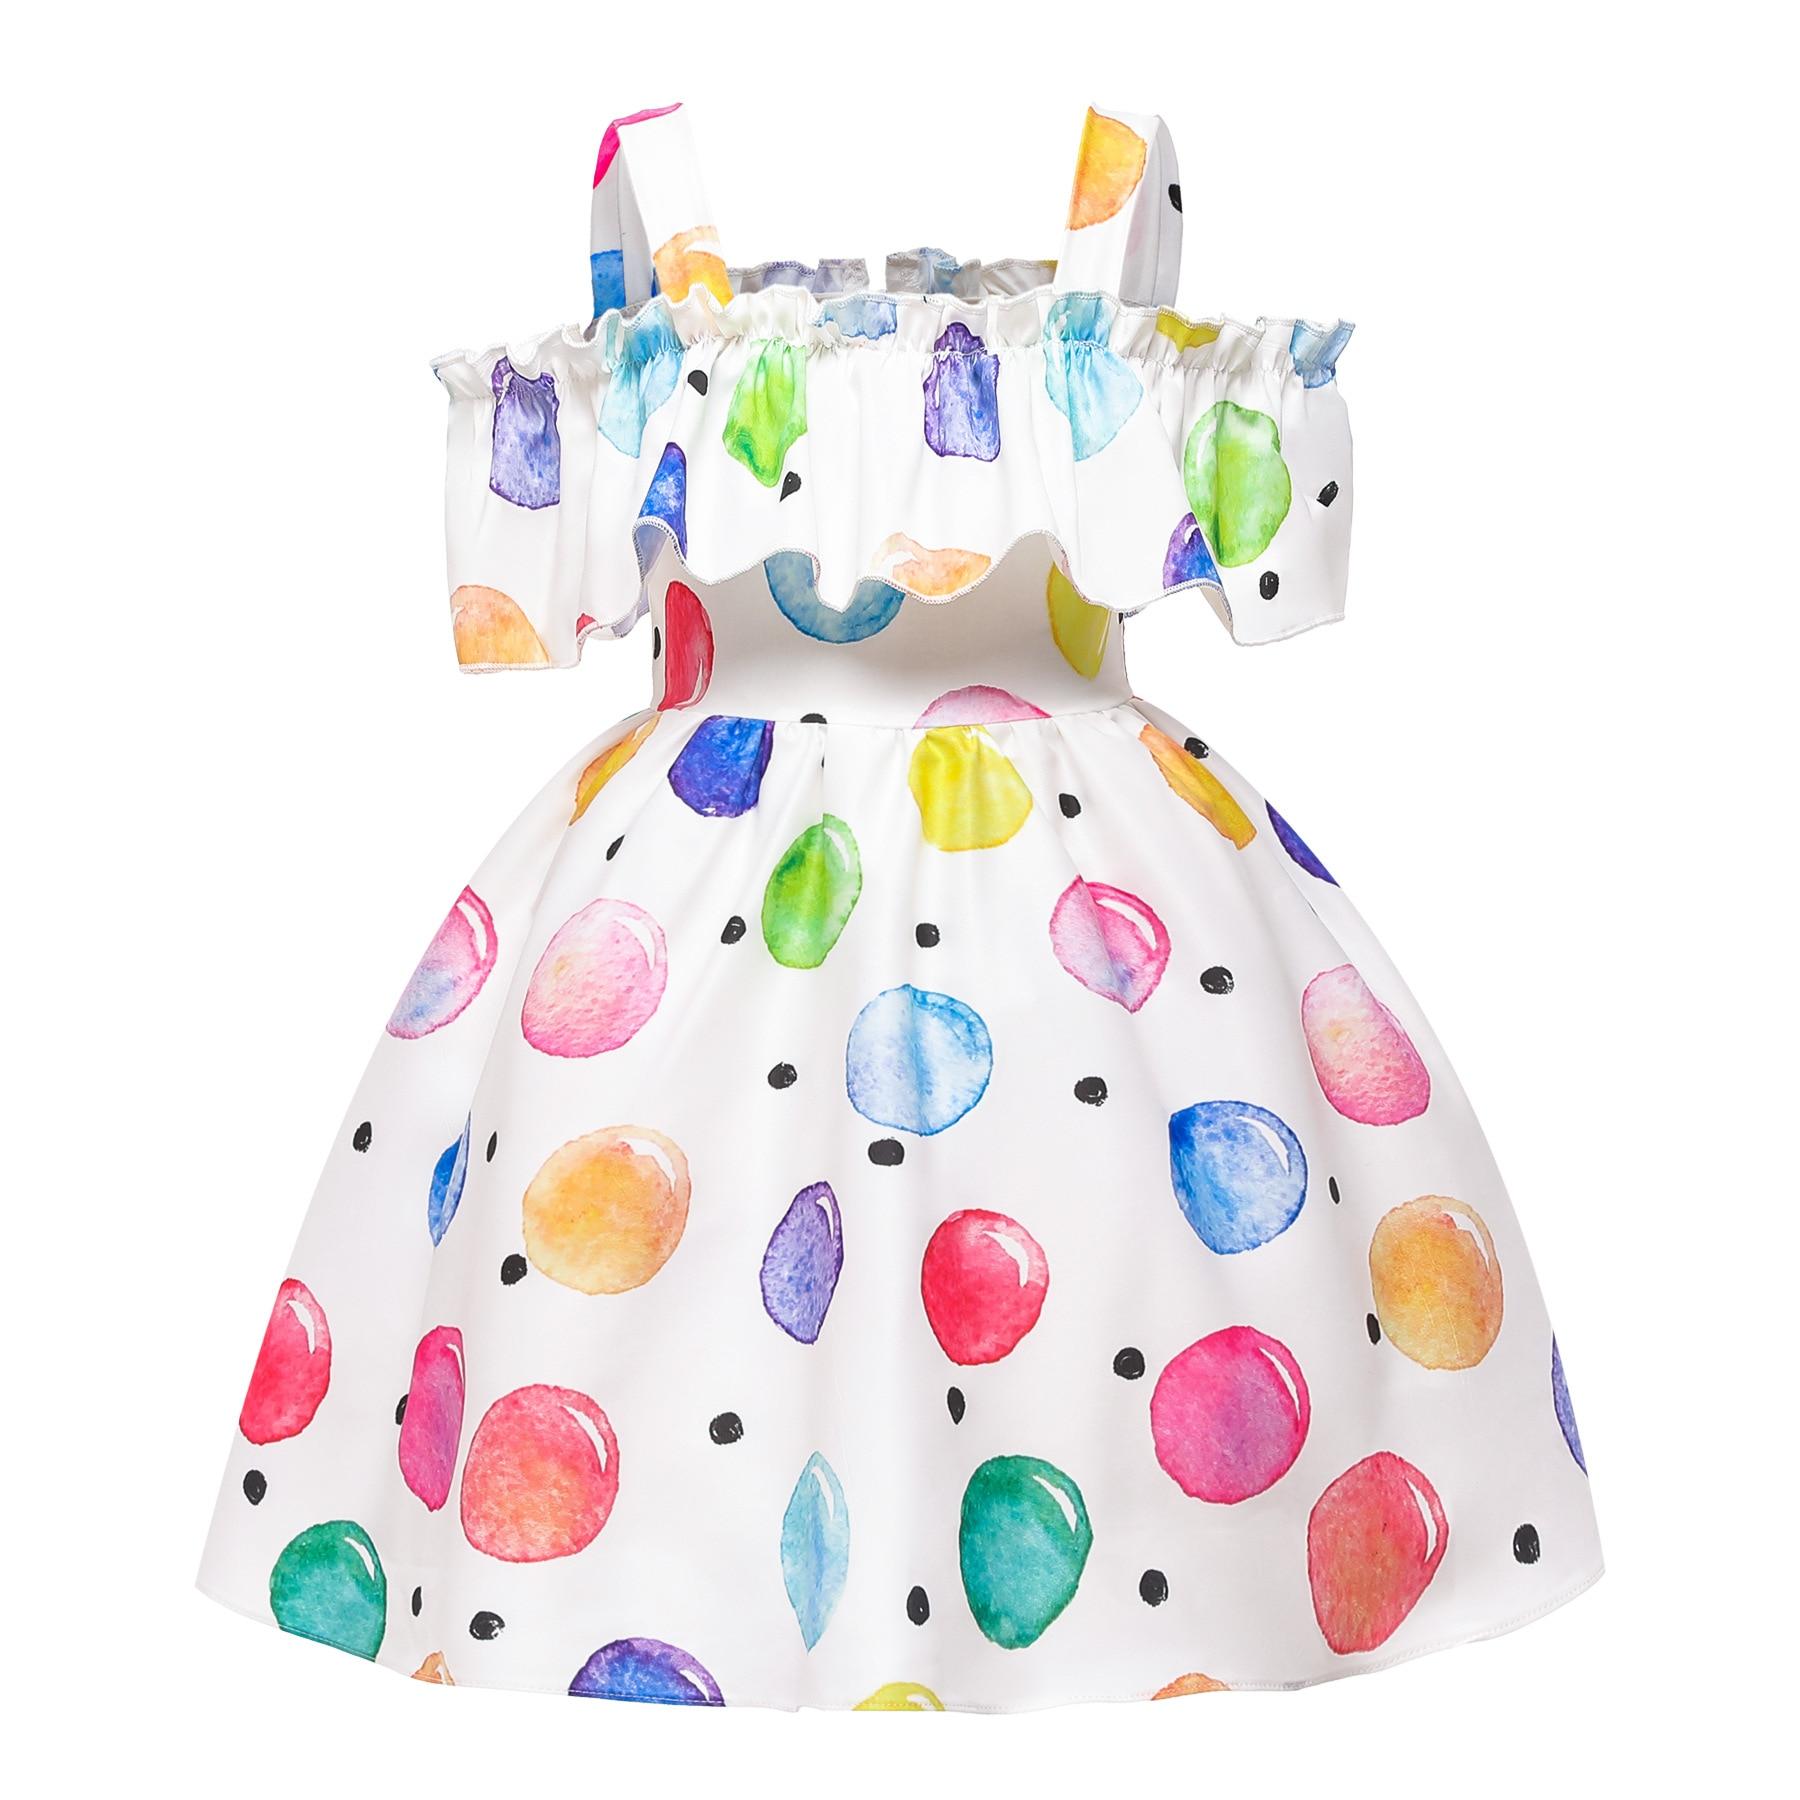 Kids Summer Dress Clothes Robe Kids Dresses For Girls Ropa Prinsessenjurken Meisjes Dress For Girls Jurk Costume Kinder Kleider